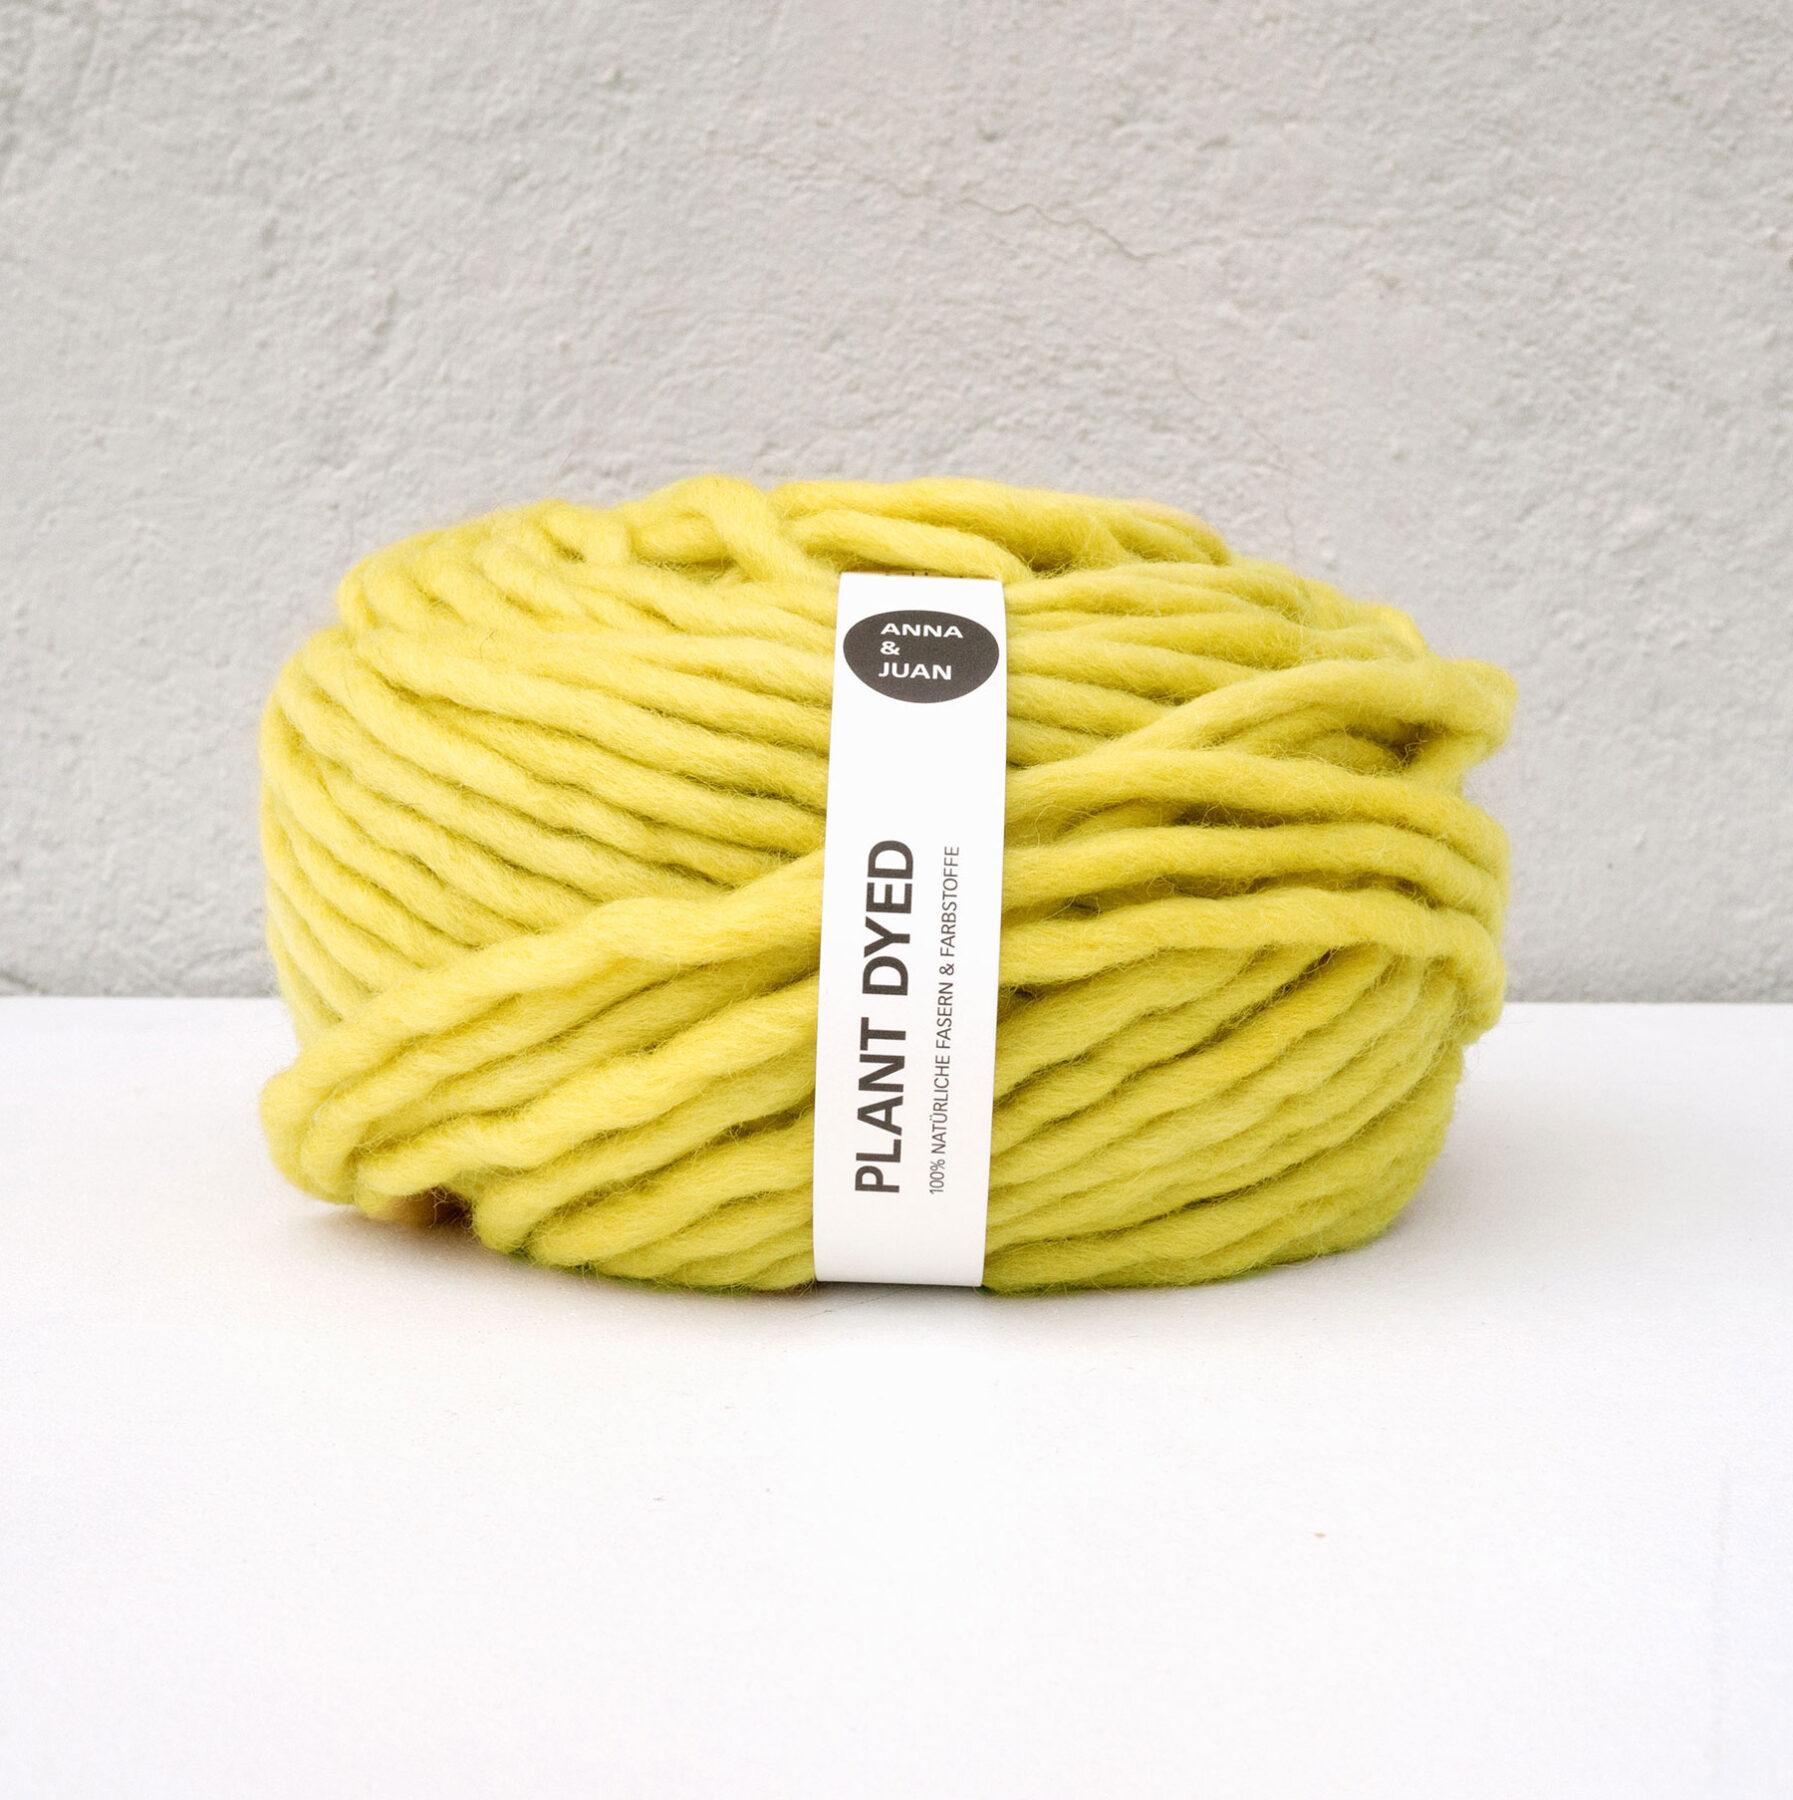 Anna & Juan Garn «Plant Dyed» – Bulky Merino – Super Bulky/Roving Weight – Reseda luteola